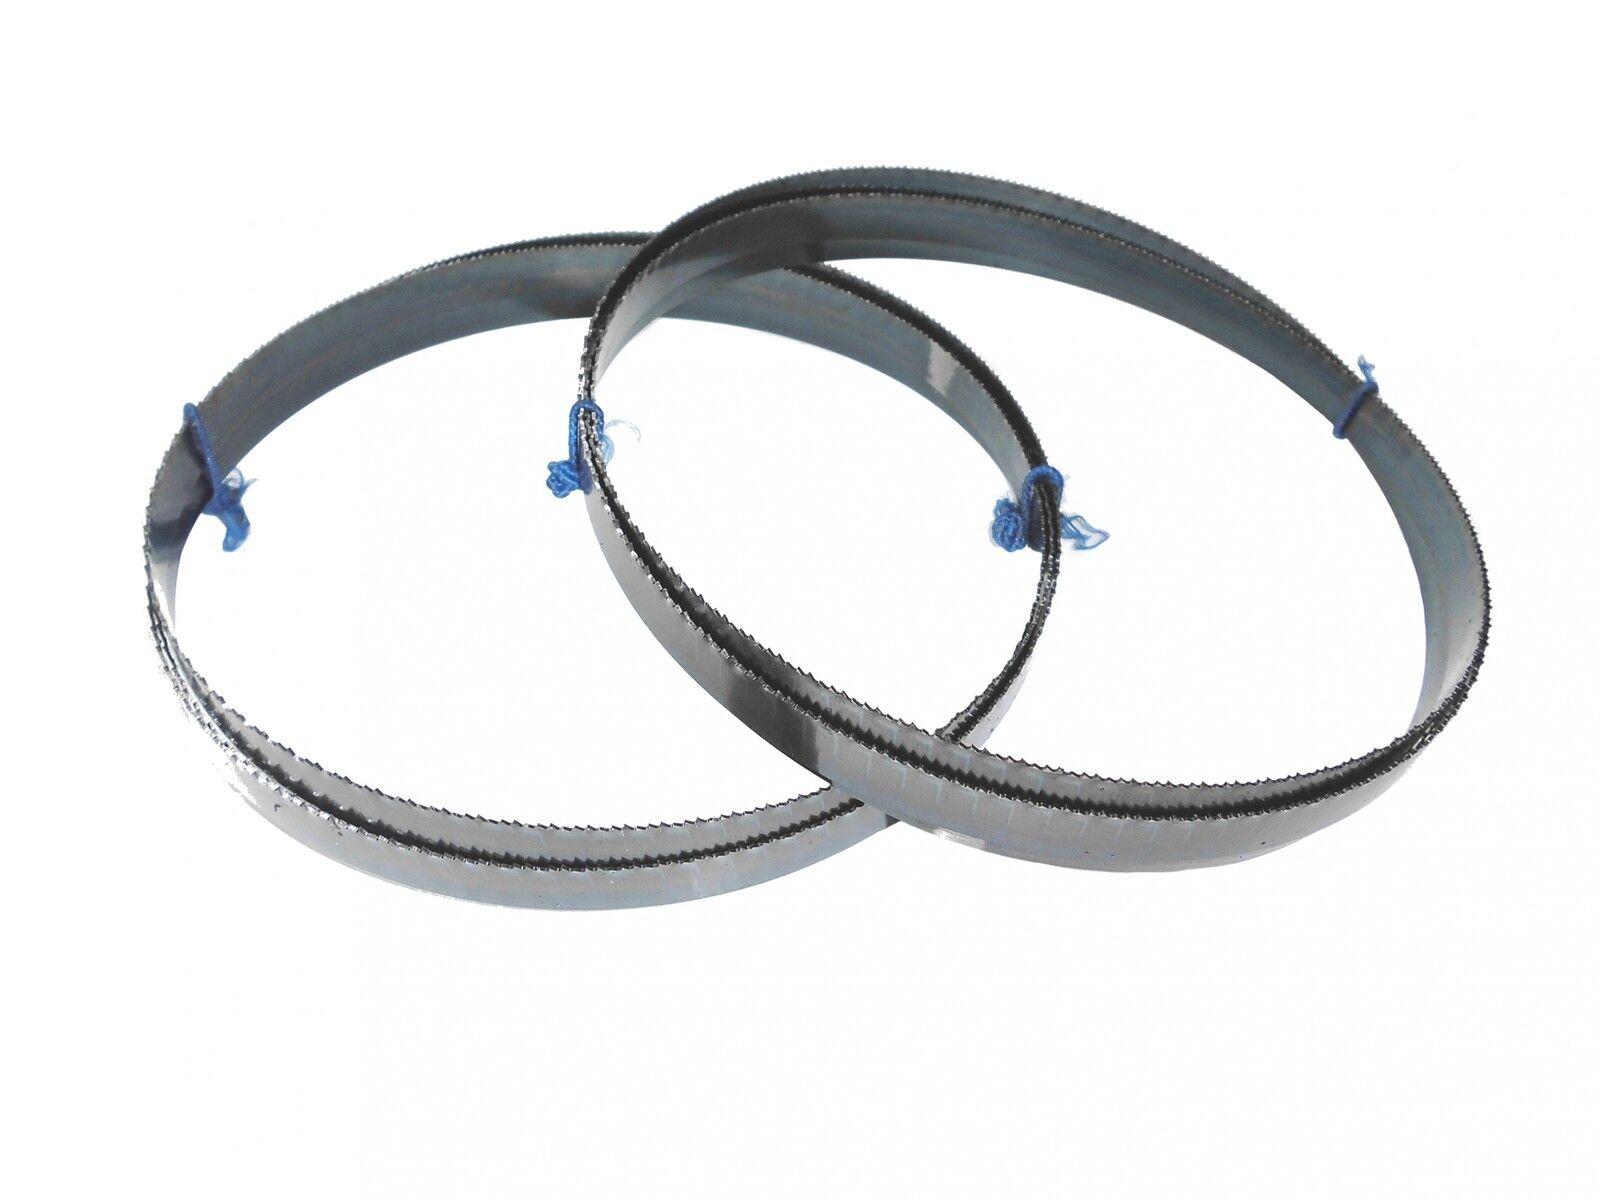 2 X Sägebänder Sägeband 1470 X 13 X 0,65 Mm 14 Zpz Metall Optimum Bernardo